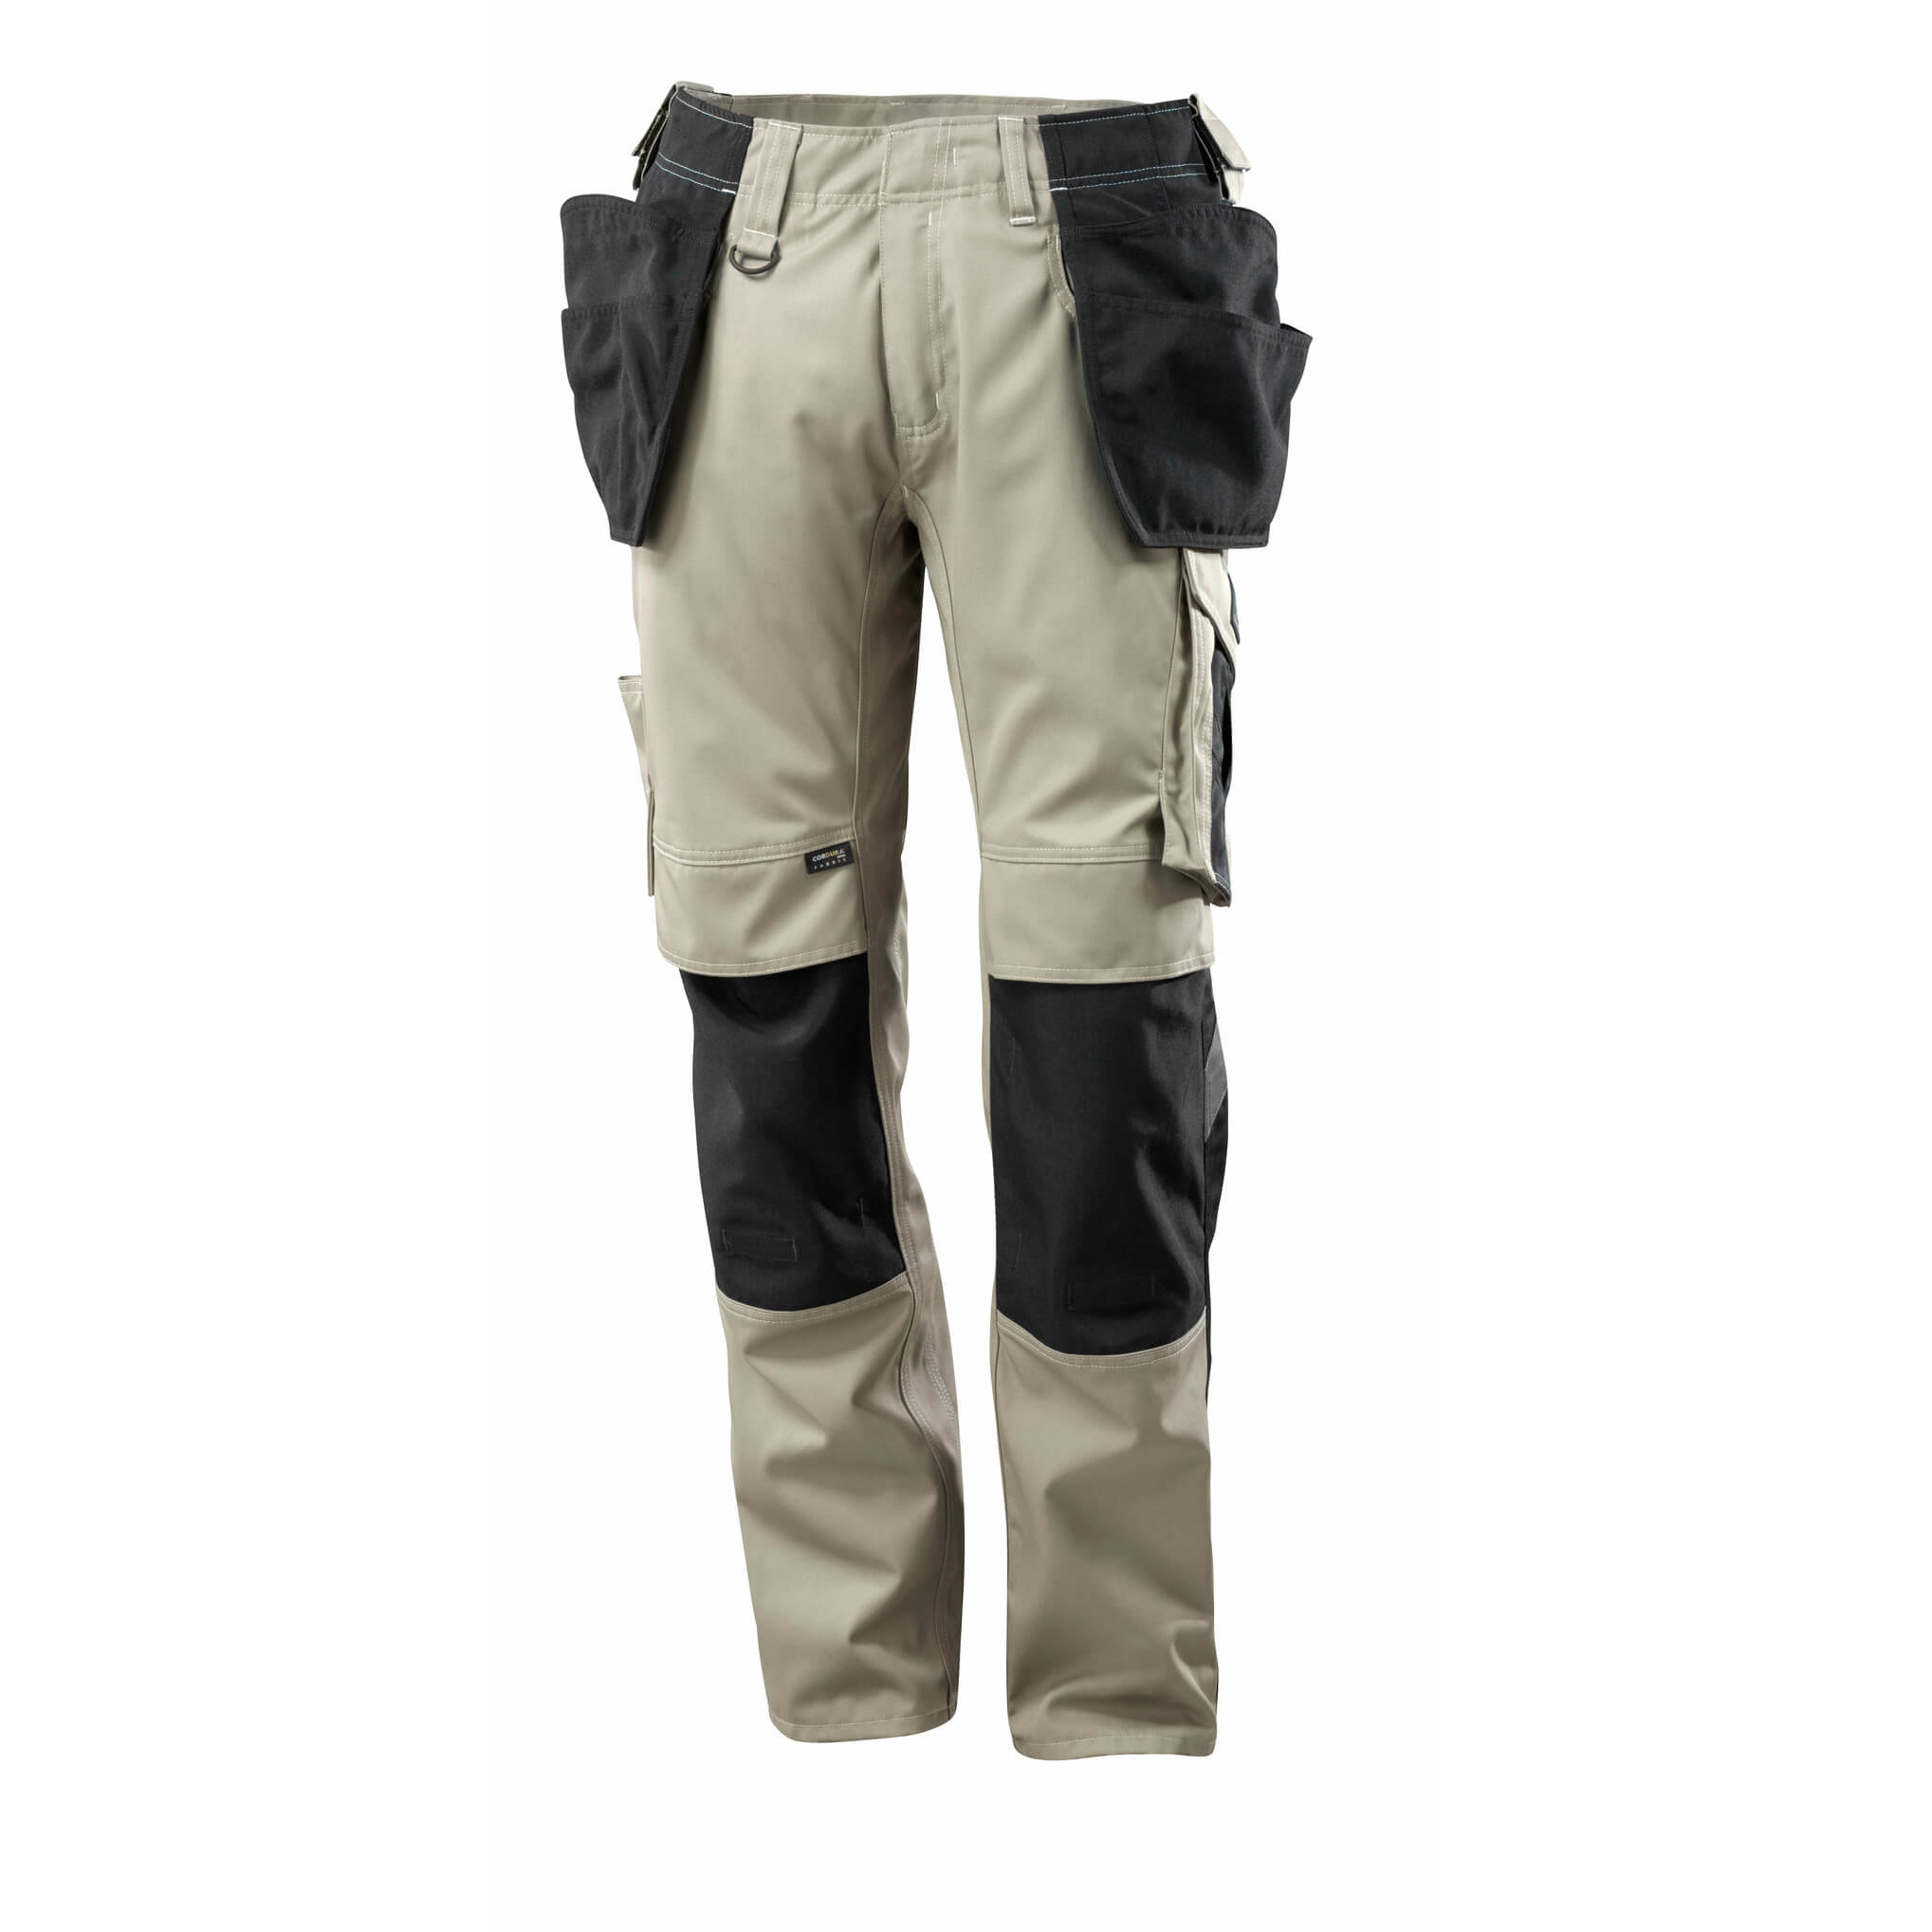 Pracovné nohavice MASCOT - UNIQUE Kassel, khaki farba